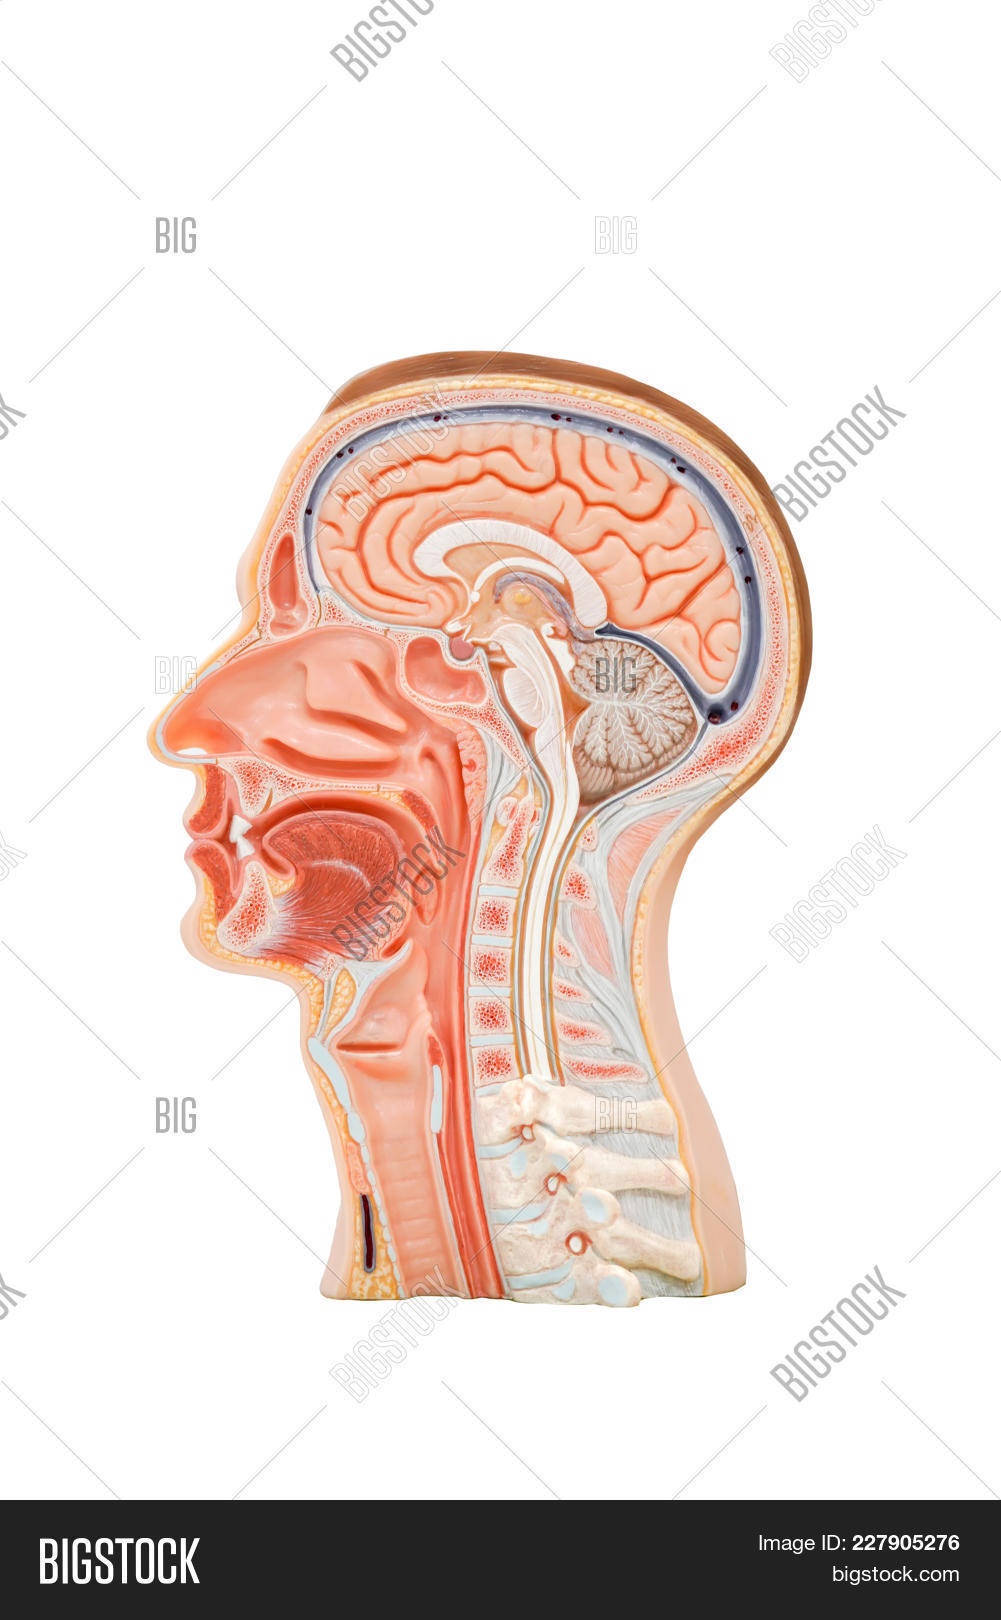 Human Head Anatomy Image Photo Free Trial Bigstock